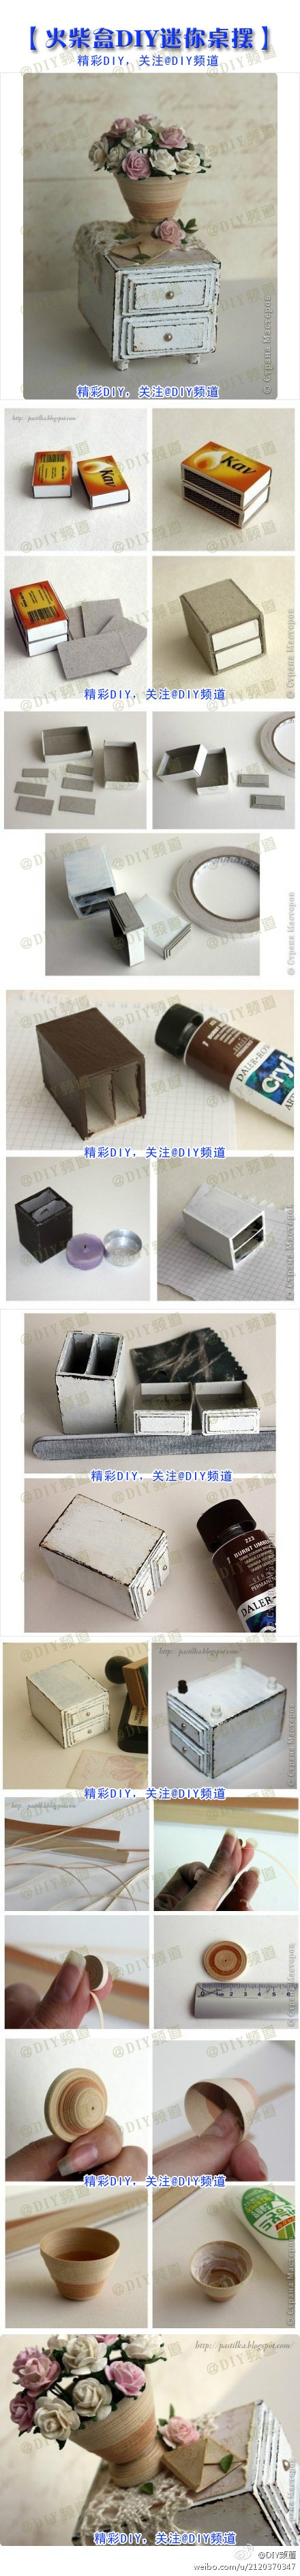 miniature-set-of-drawers-tutorial